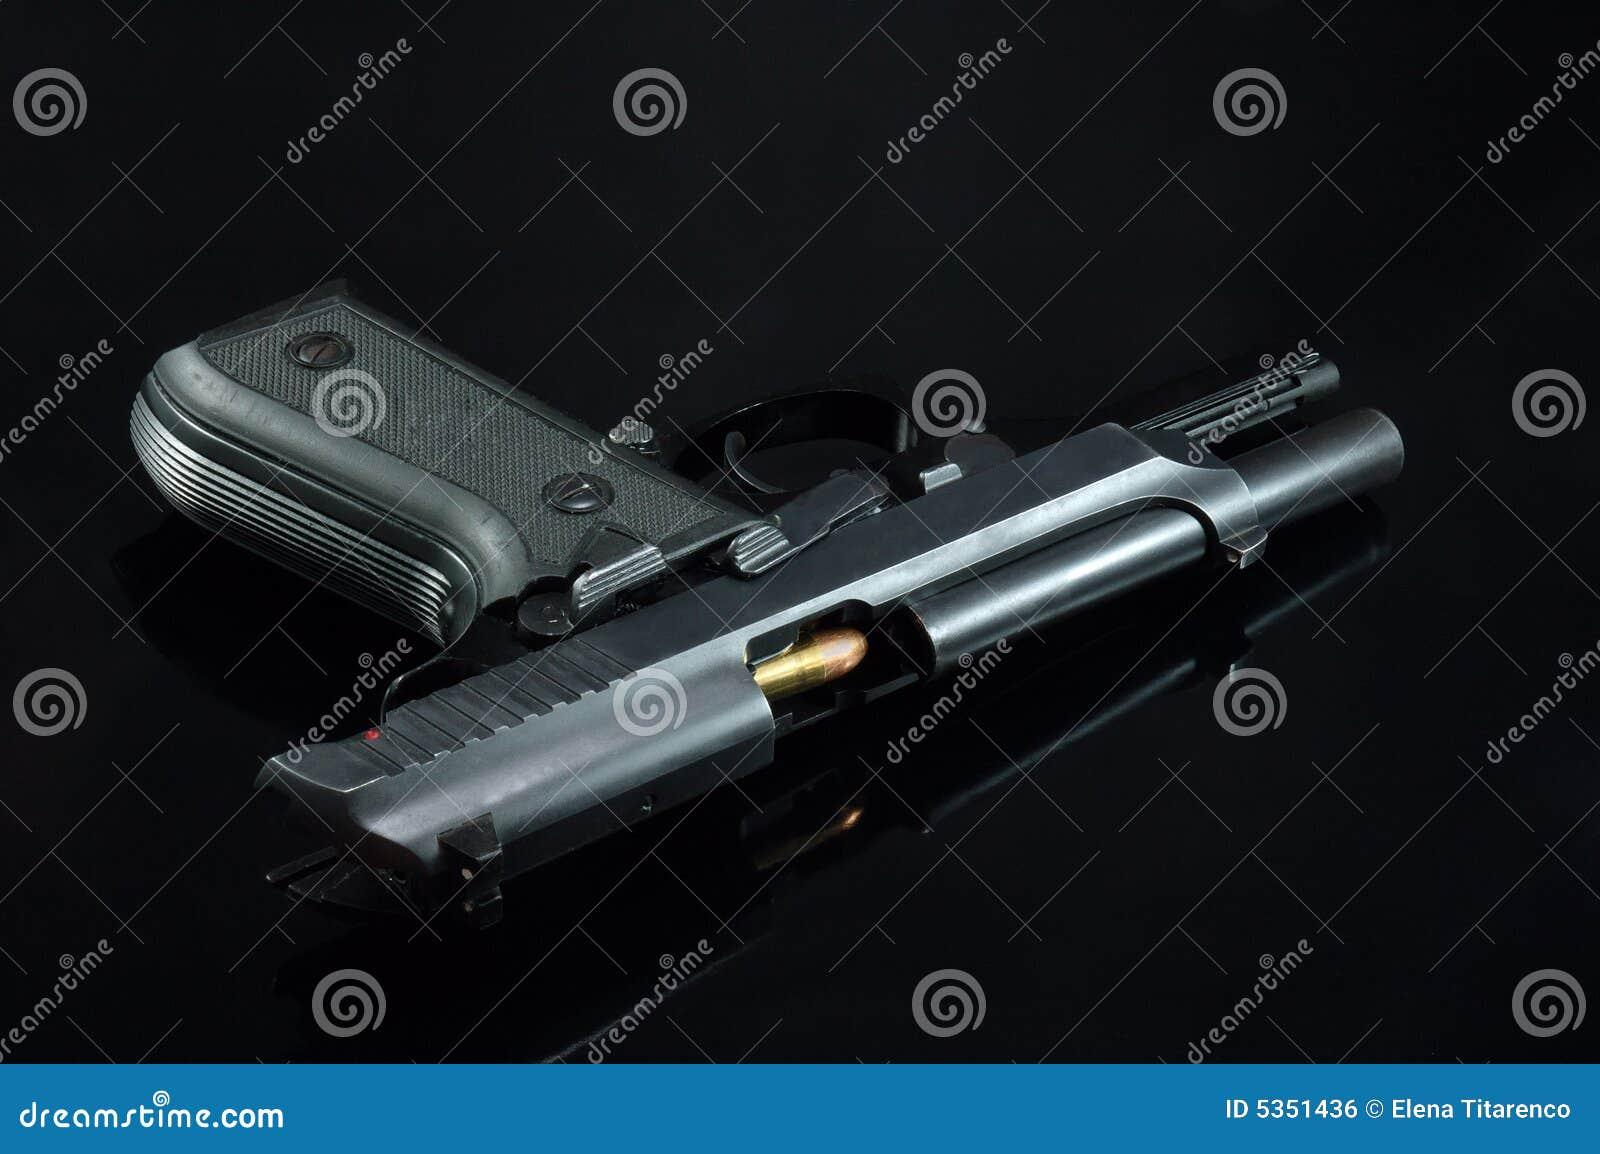 blackguns black guns bullets - photo #22